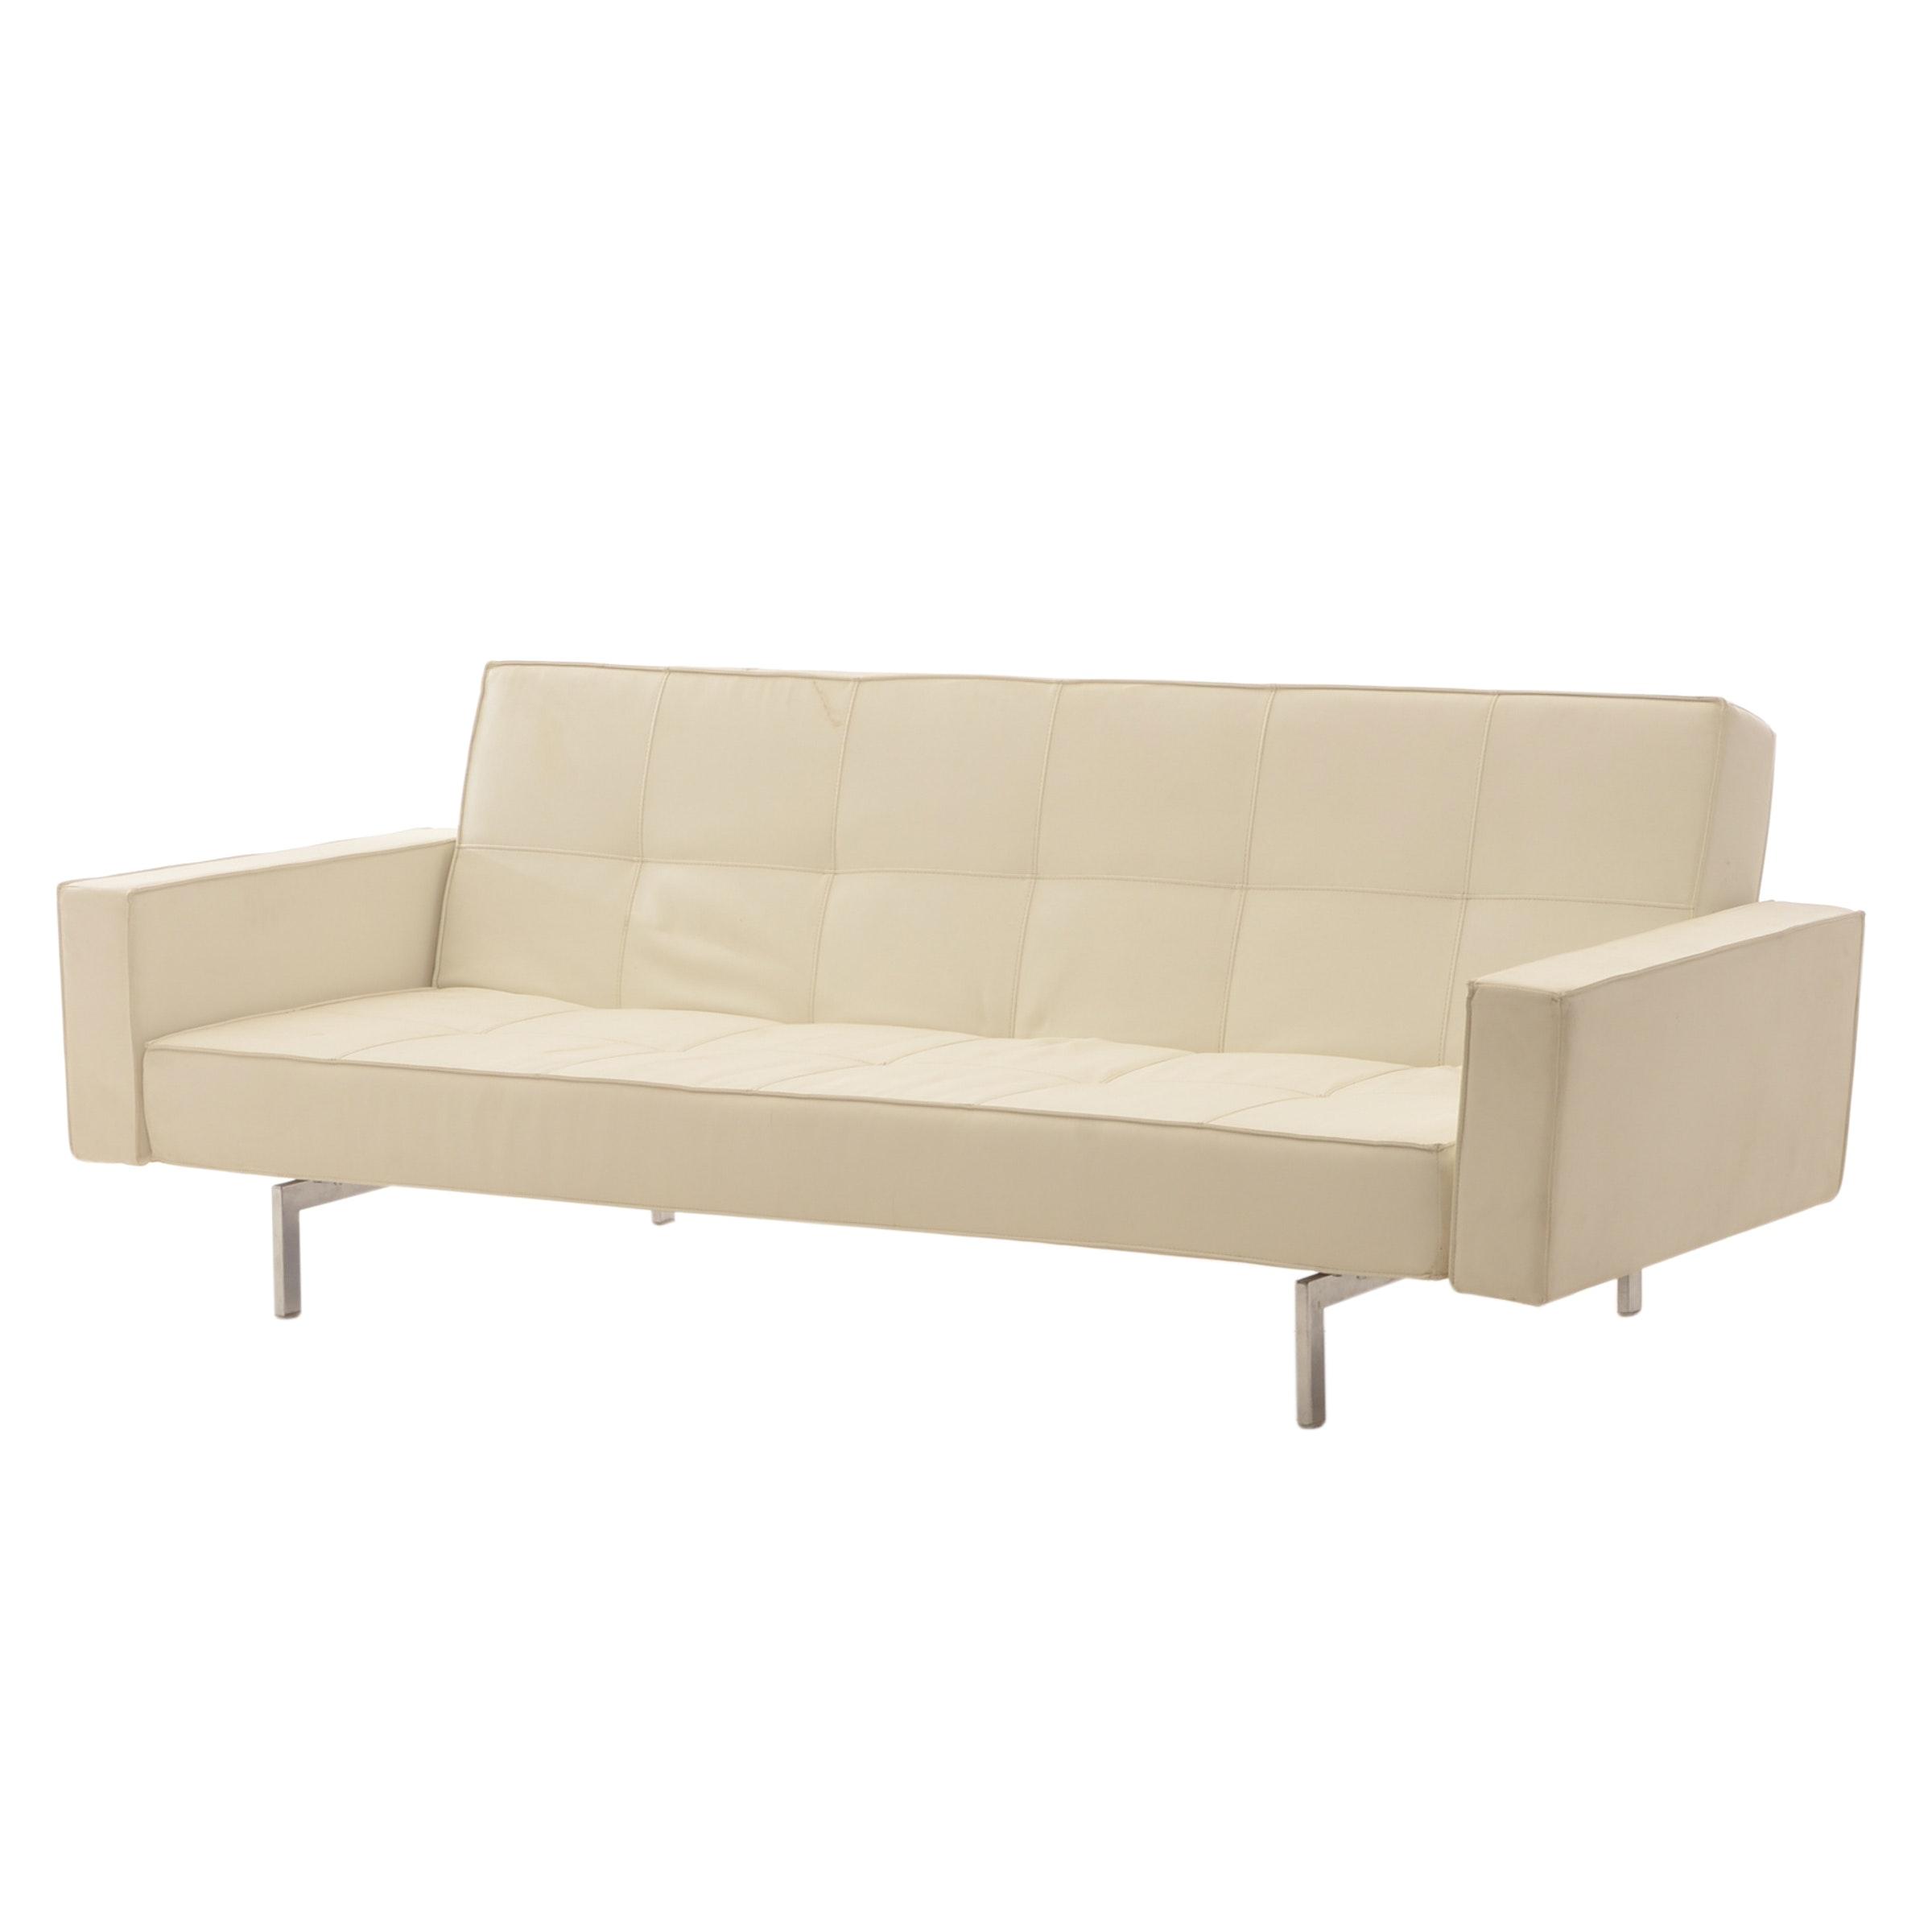 White Vinyl Sofa / Daybed